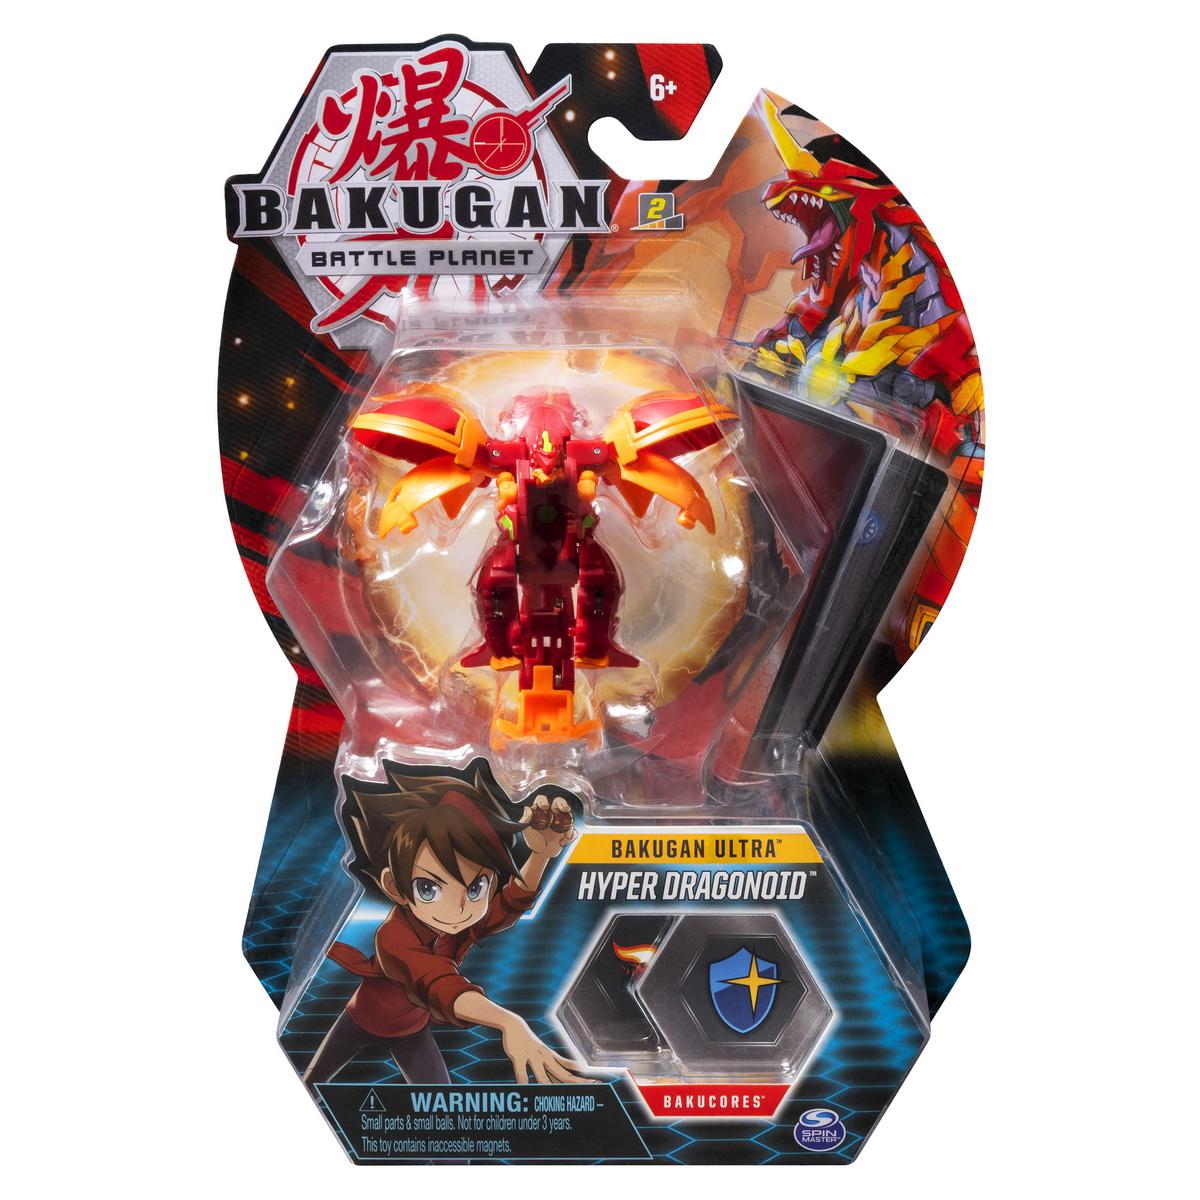 Bakugan Bila Ultra Hyper Dragonoid